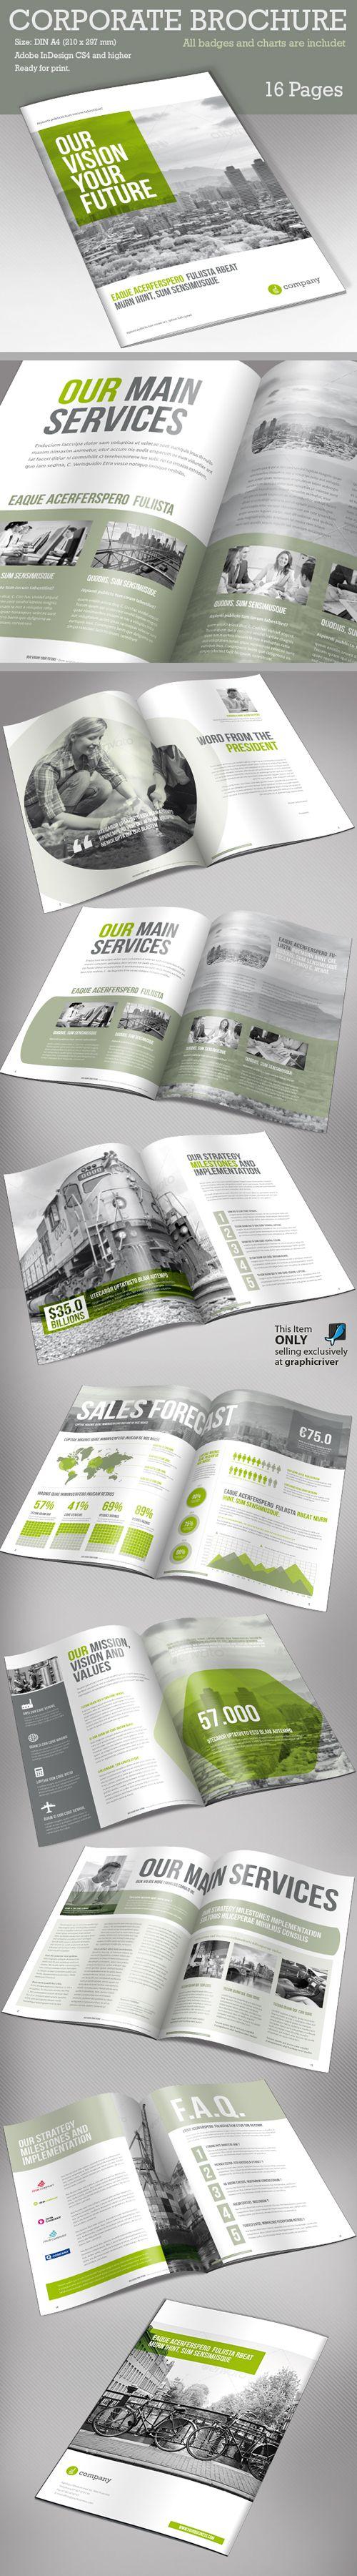 Corporate Brochure Template v